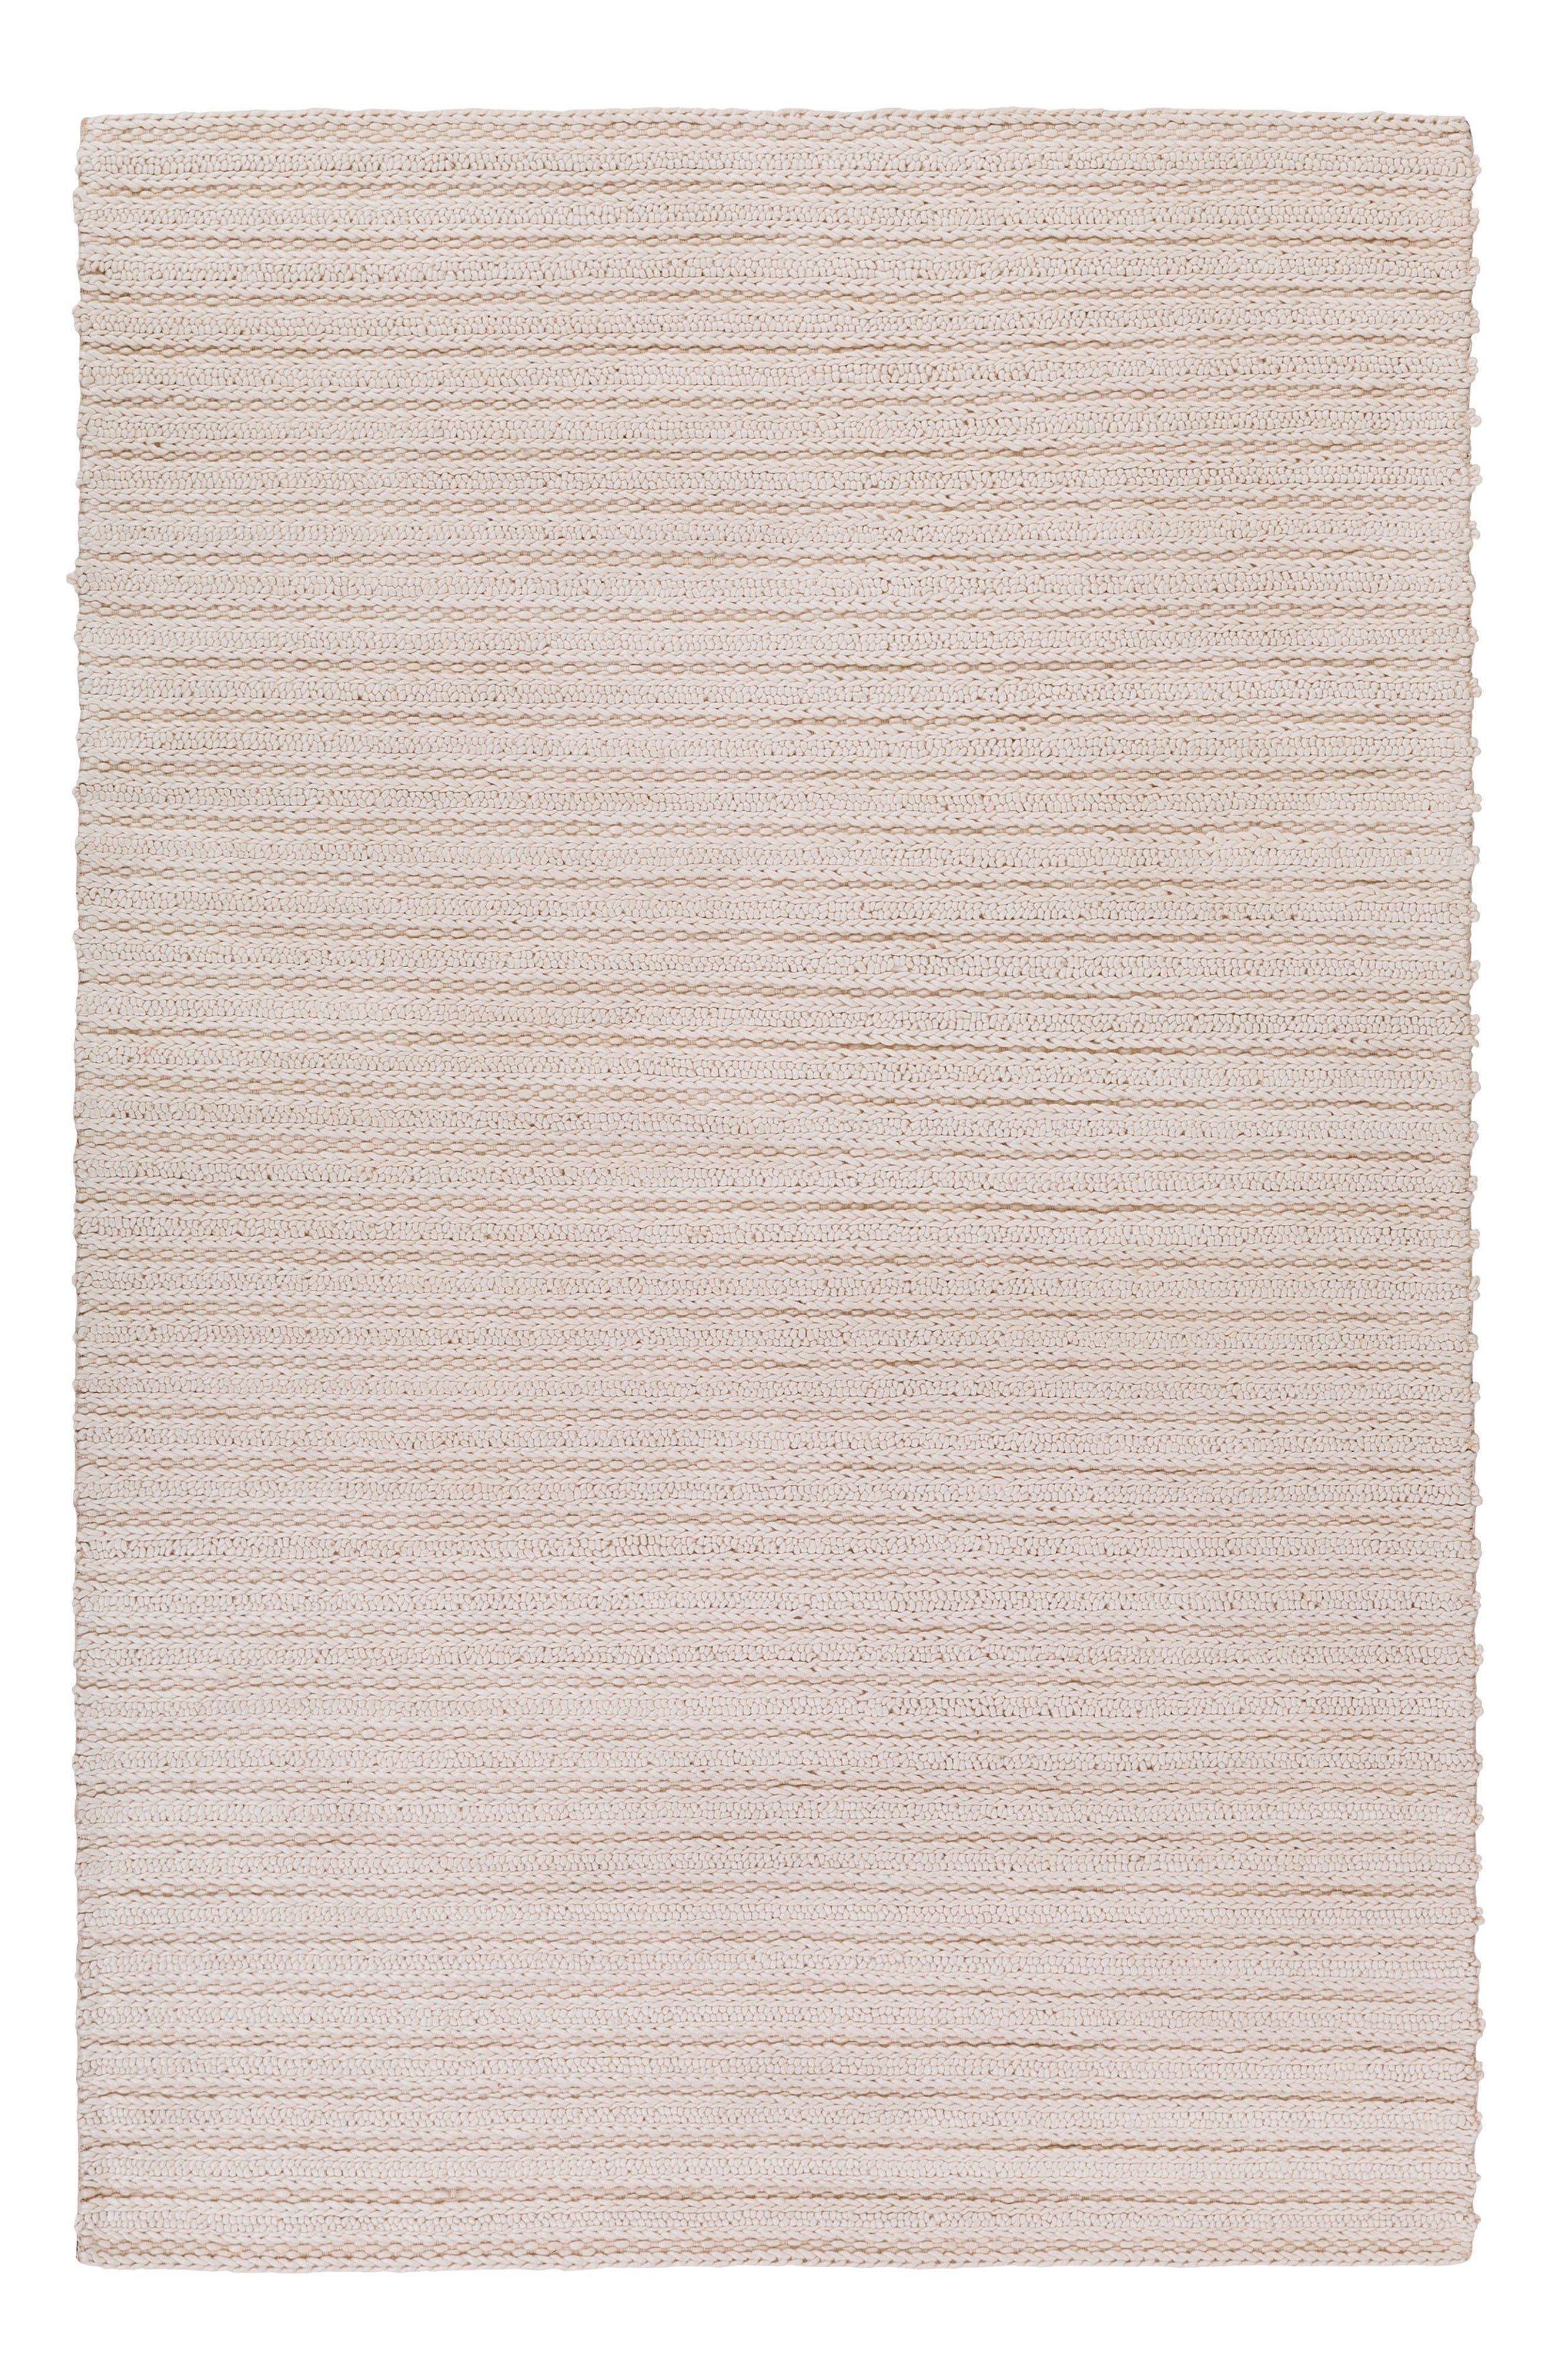 Kindred Rug,                             Main thumbnail 1, color,                             White